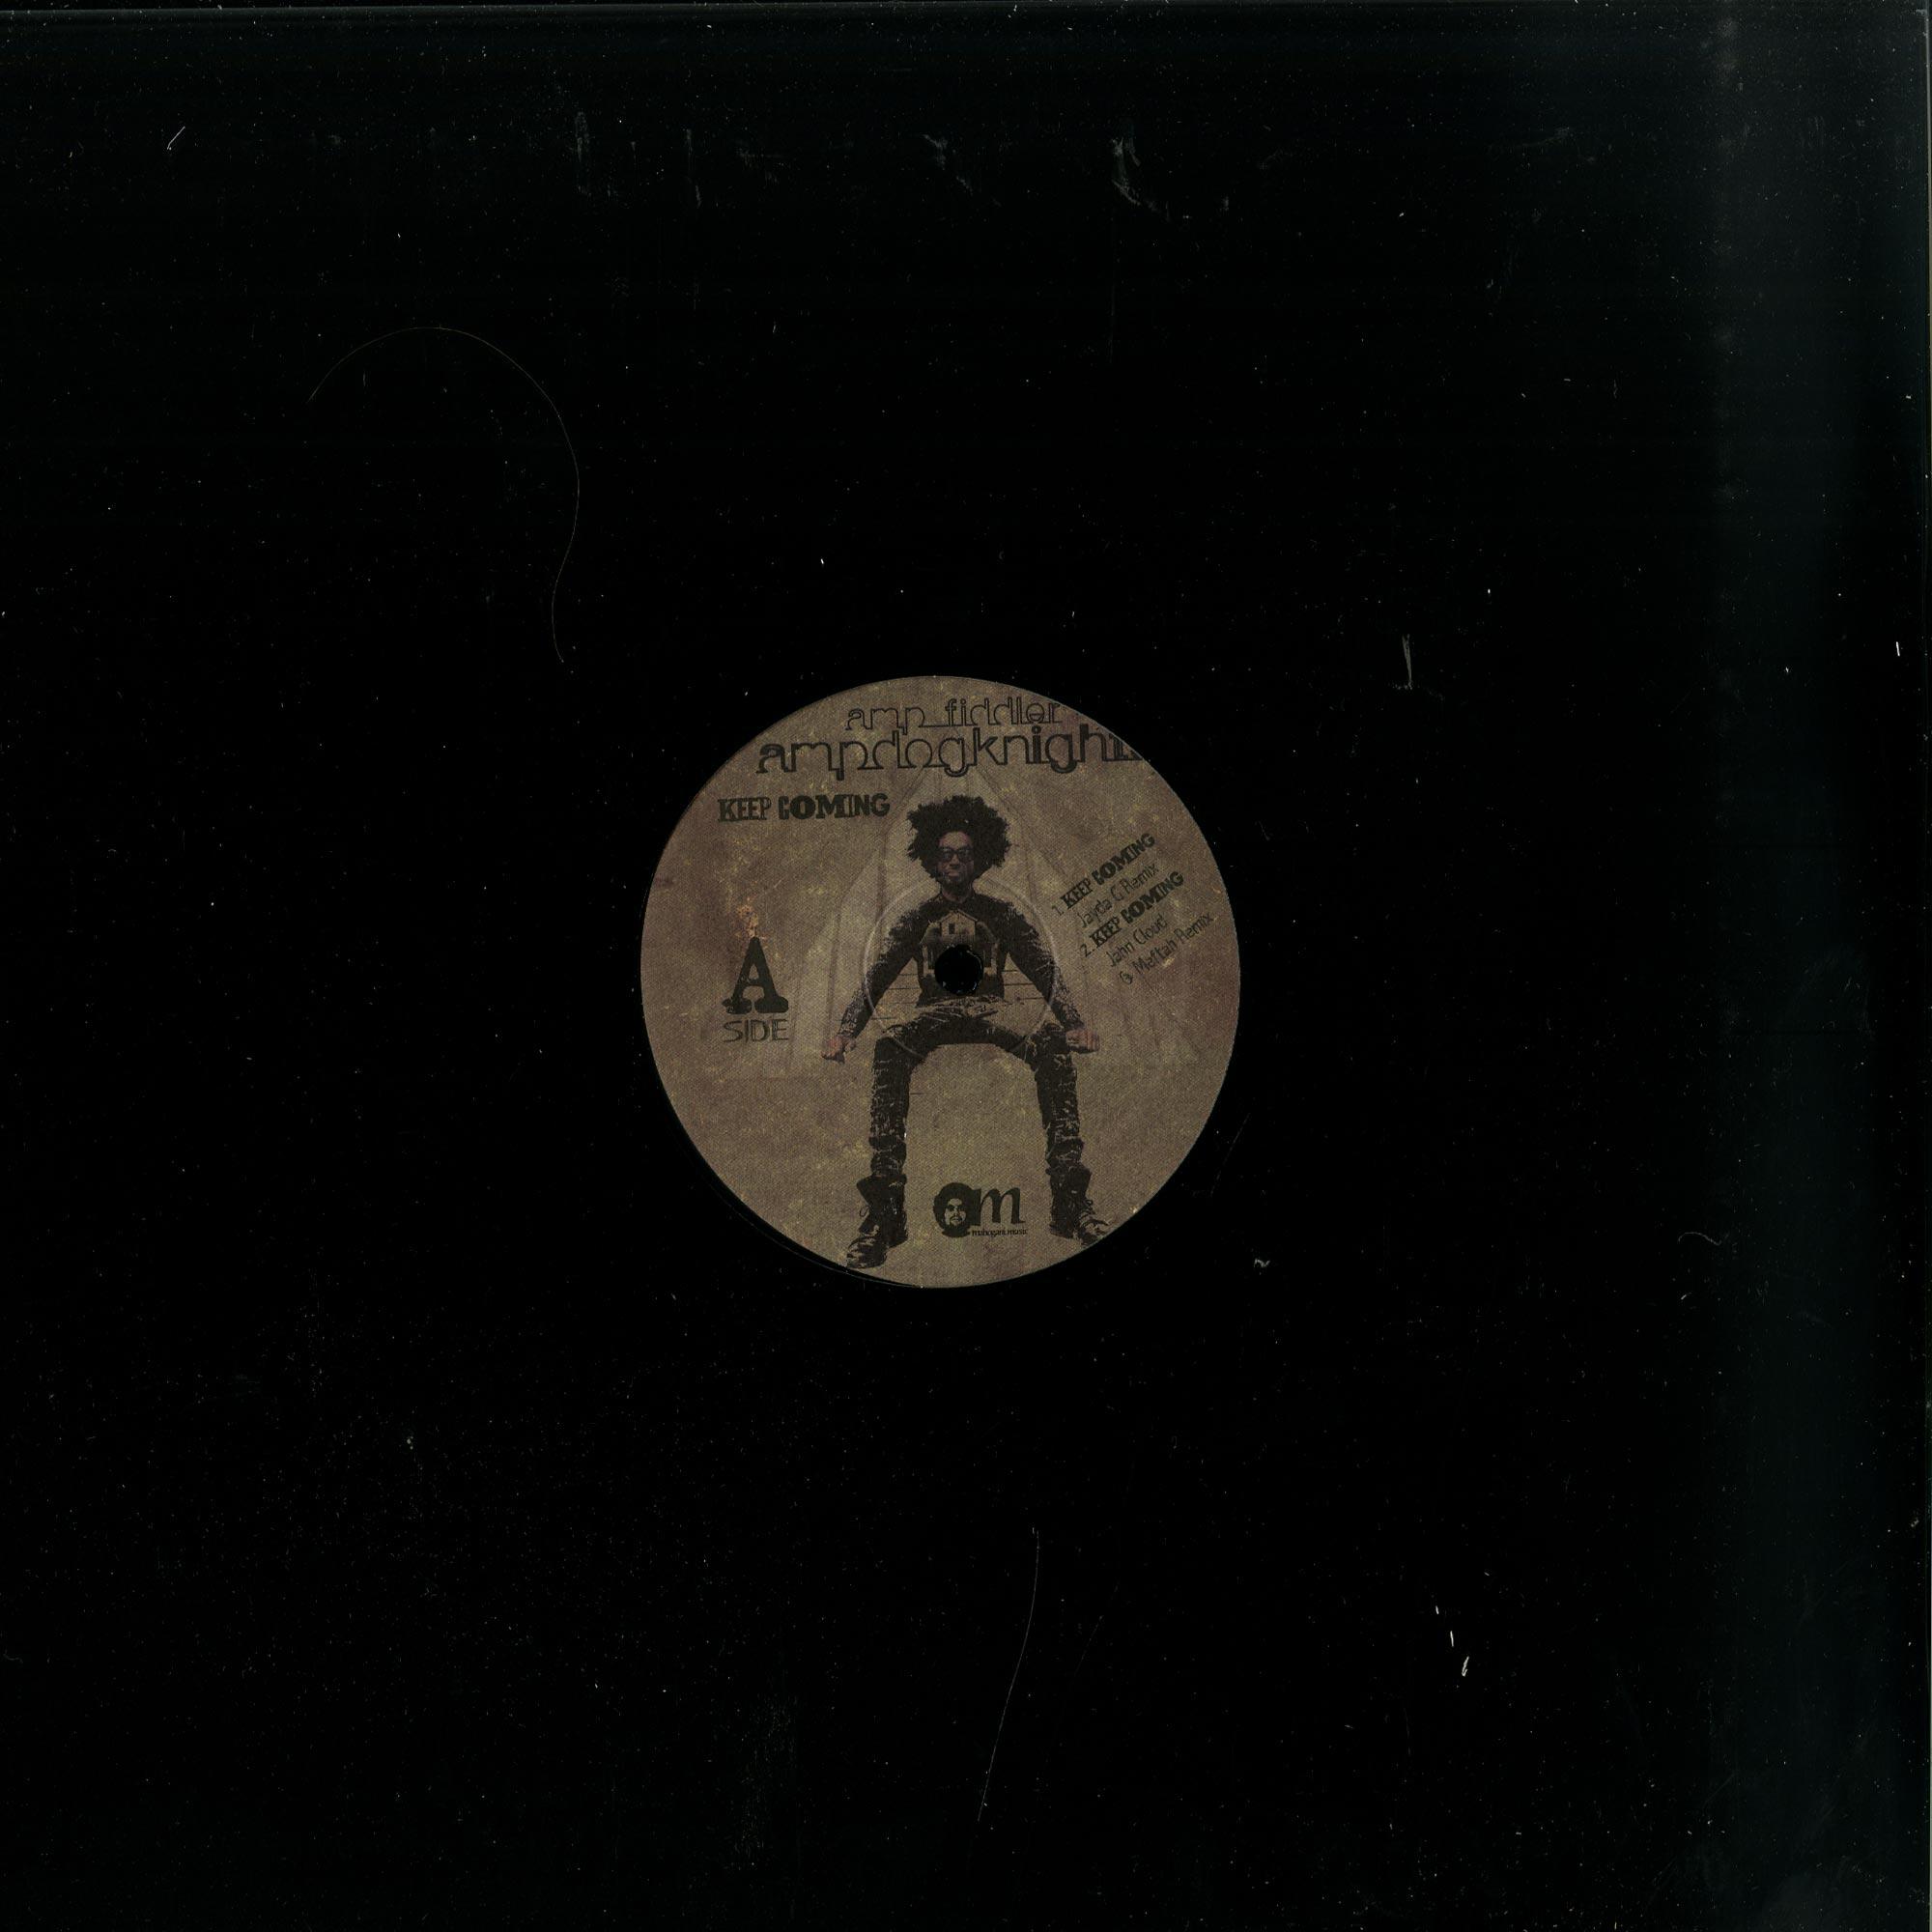 Amp Fiddler - KEEP COMING REMIX